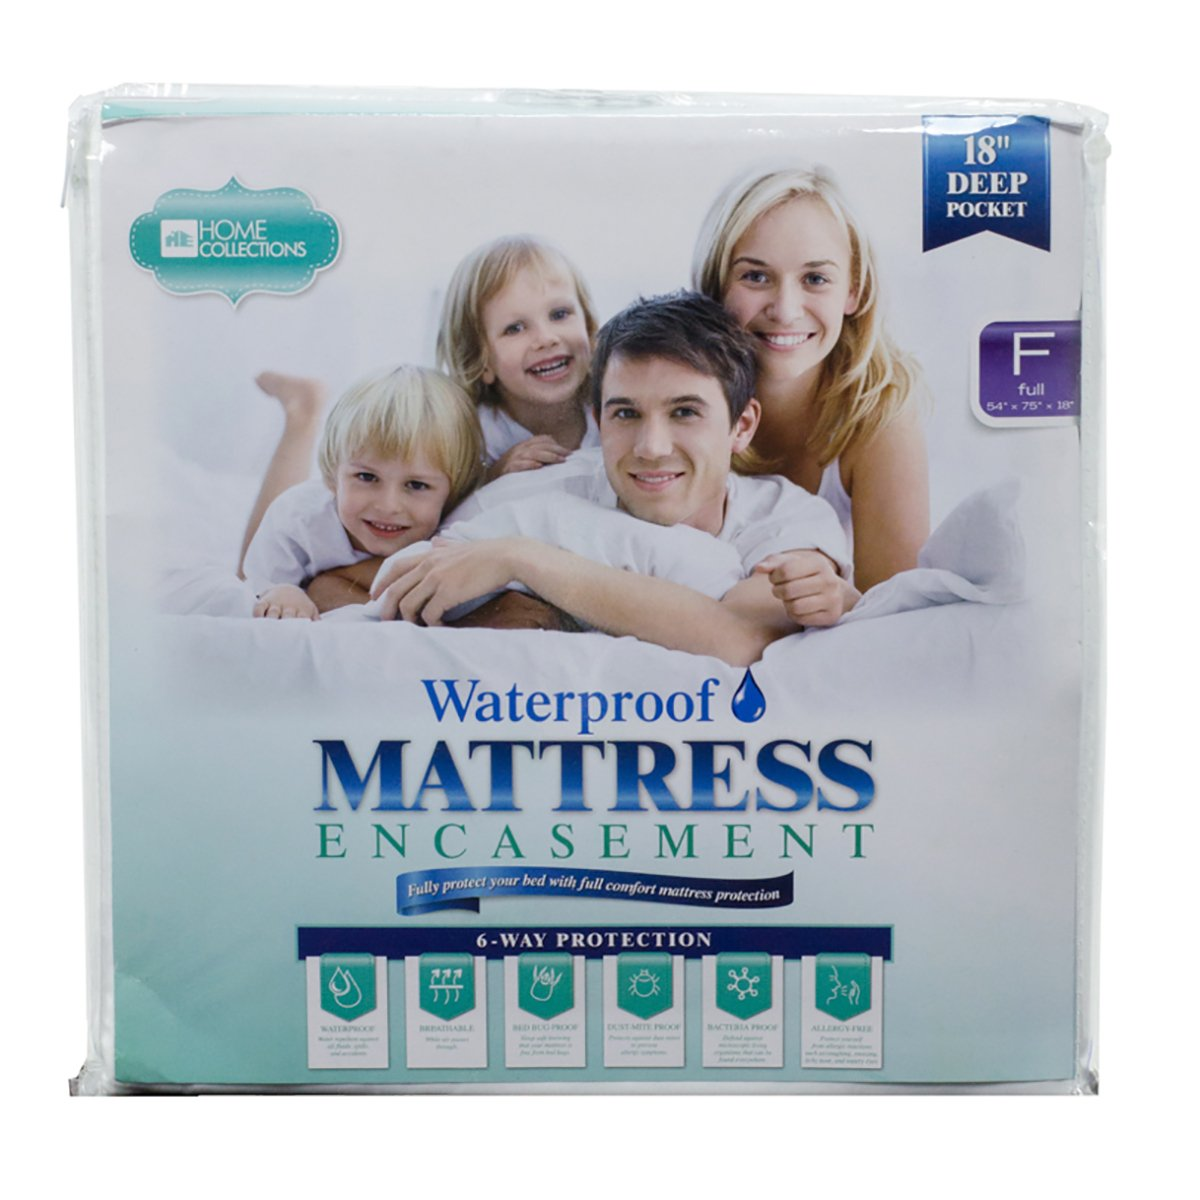 BD-5231 Mattress Encasement - 100% Waterproof, Bed Bug Proof, Hypoallergenic - Premium Zippered Six-Sided Cover Deep Pocket (Full)